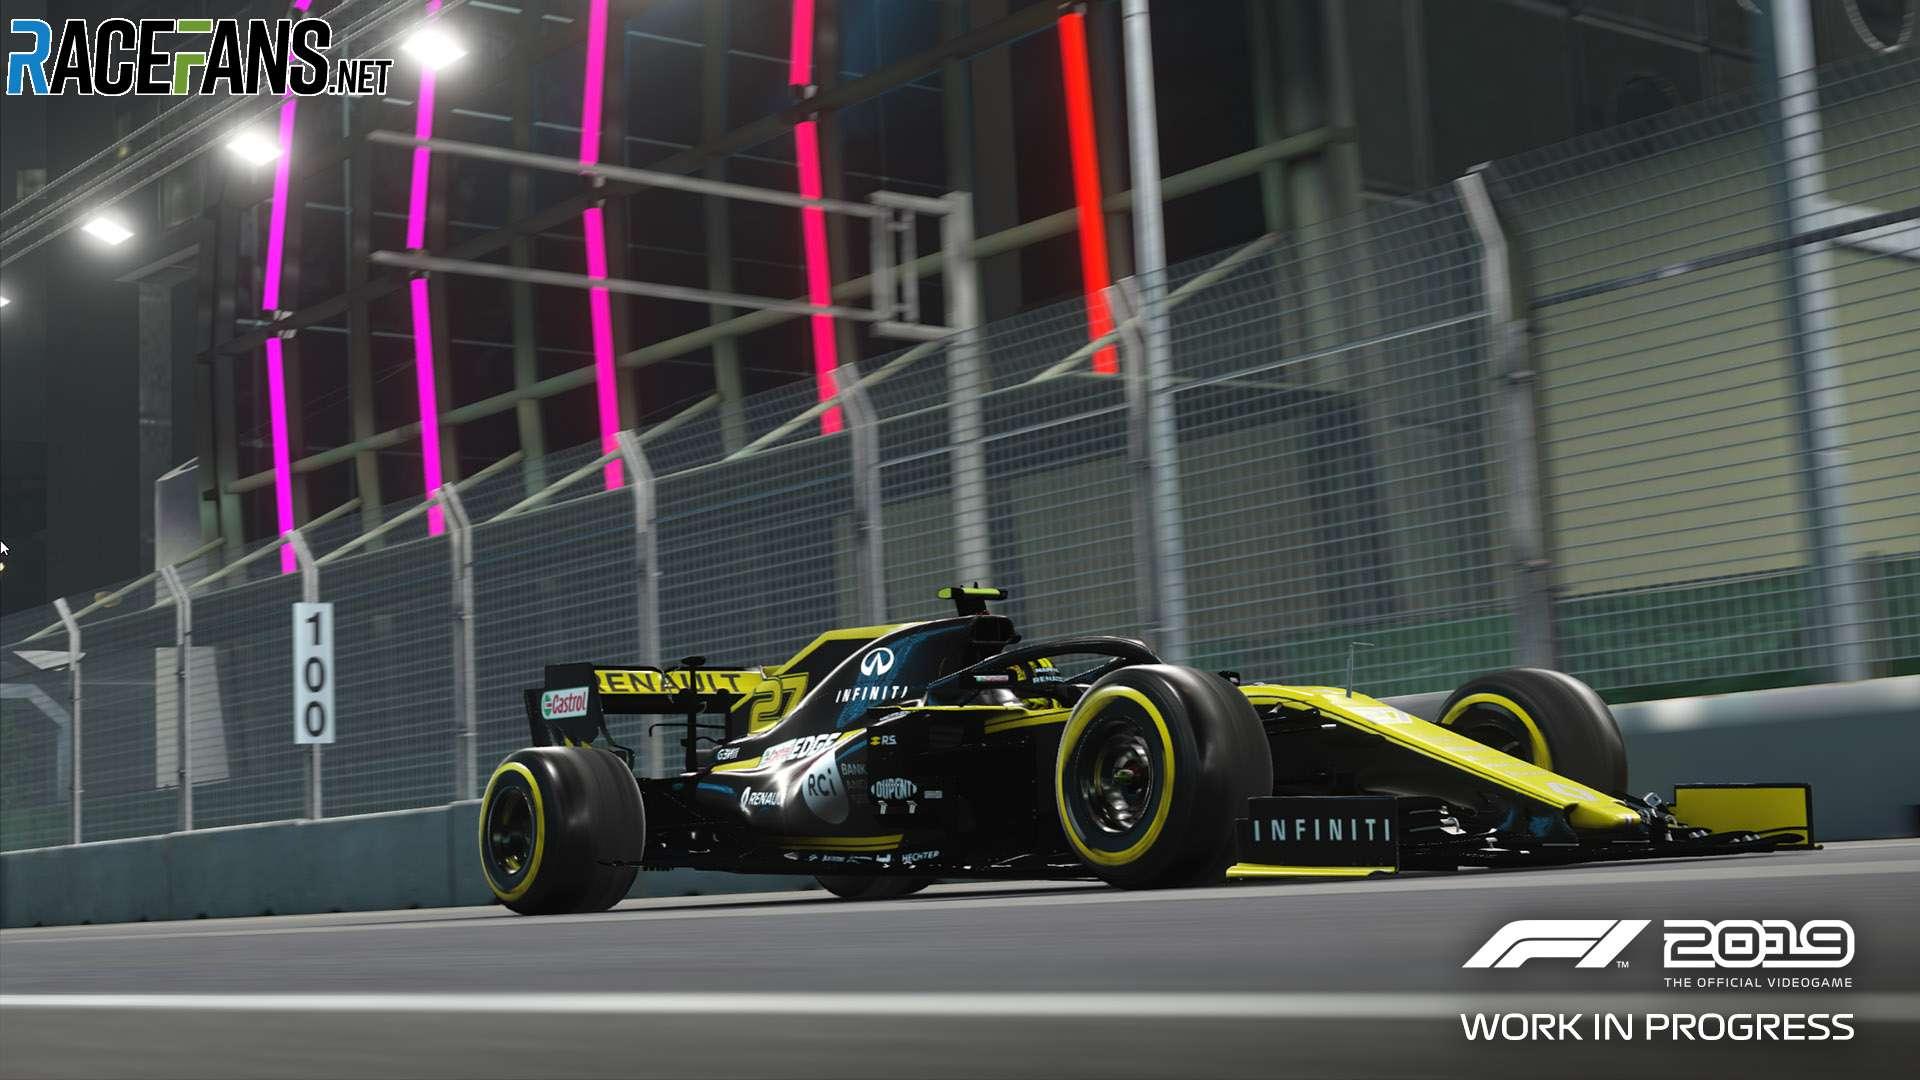 F1 2019: Renault